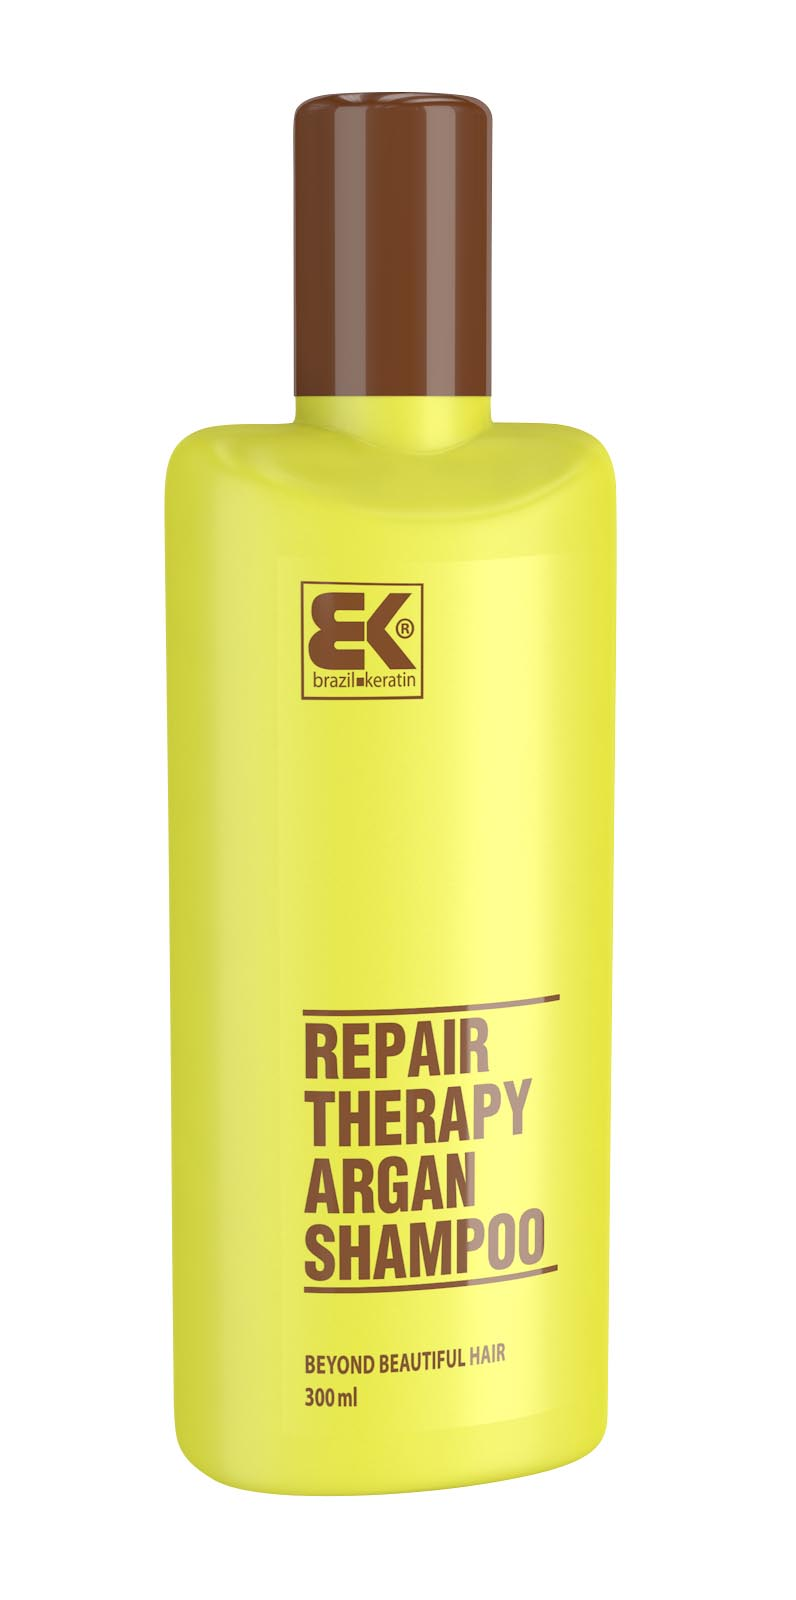 Brazil Keratin Repair Therapy Argan Shampoo - regenerační šampon s arganovým olejem 300ml